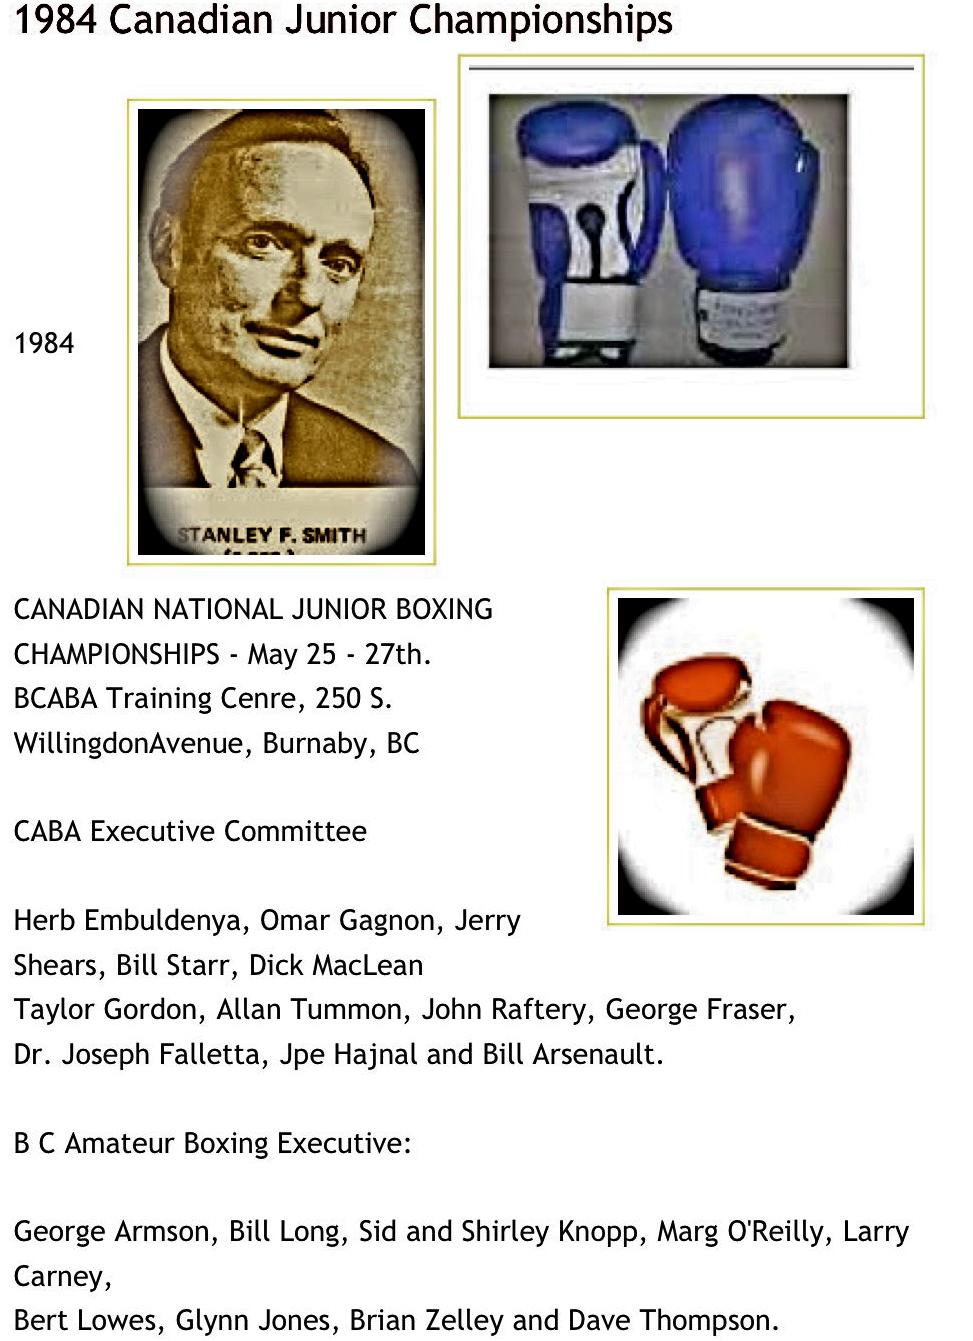 Scotia amateur boxing feasts